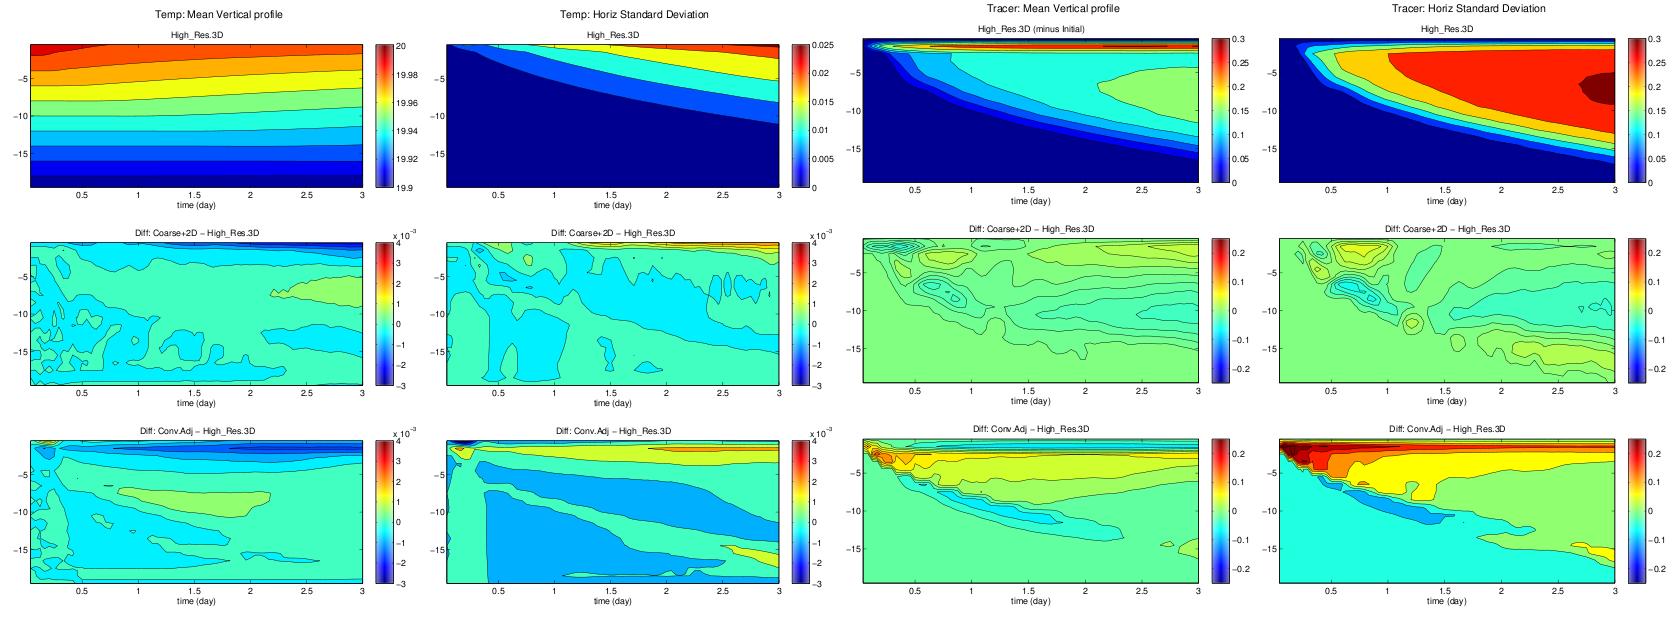 Figure 3. Evolution of vertical profiles of temperature, temperature standard deviation, tracer and tracer standrad deviation.